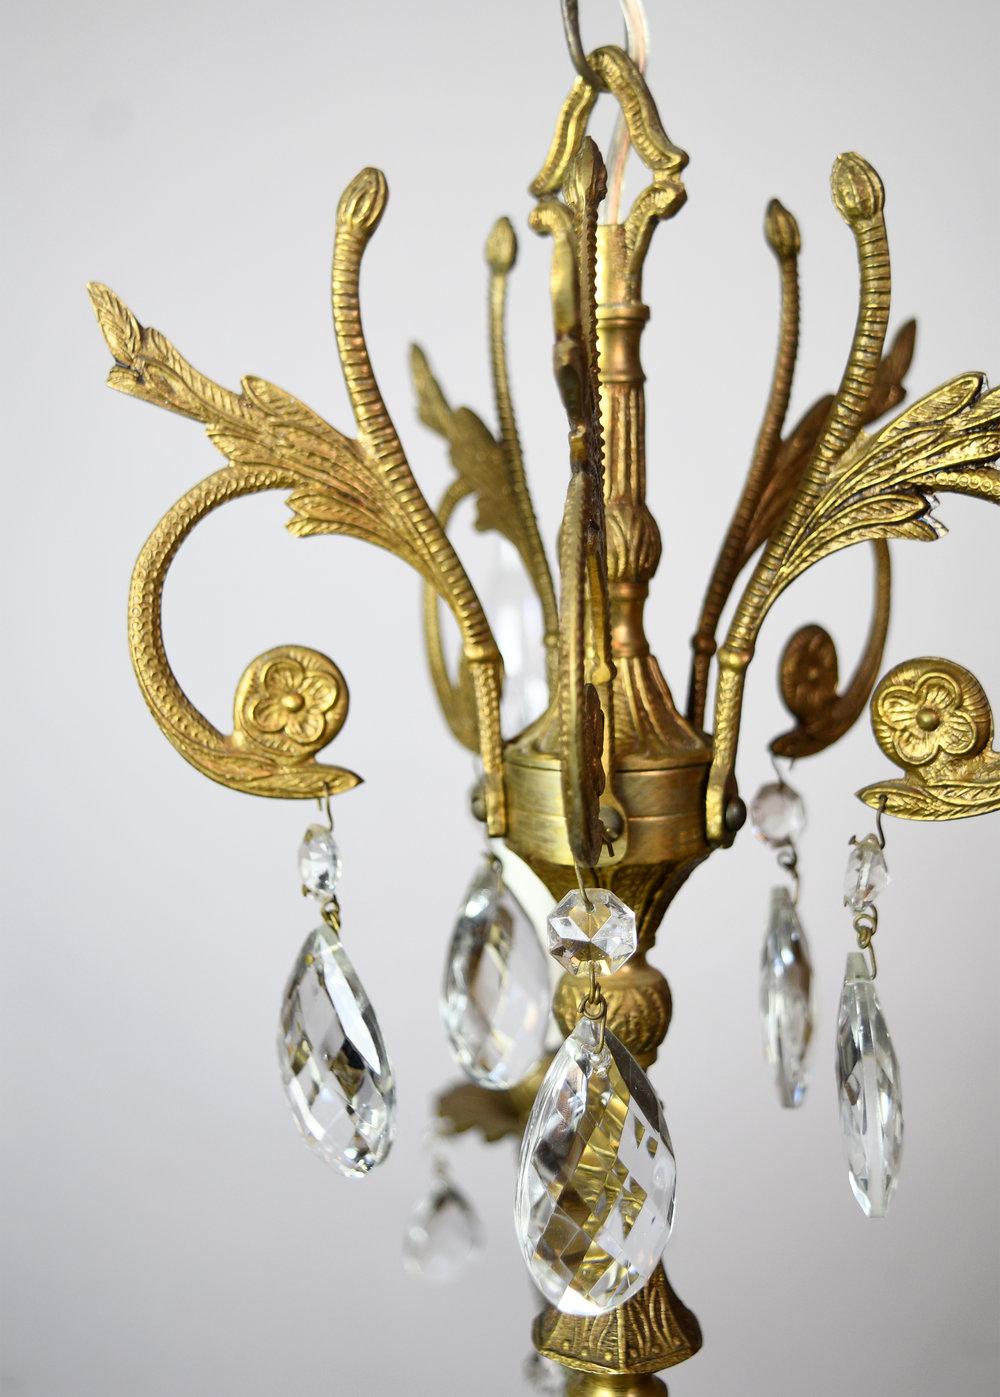 5-arm-spanish-chandelier-10.jpg